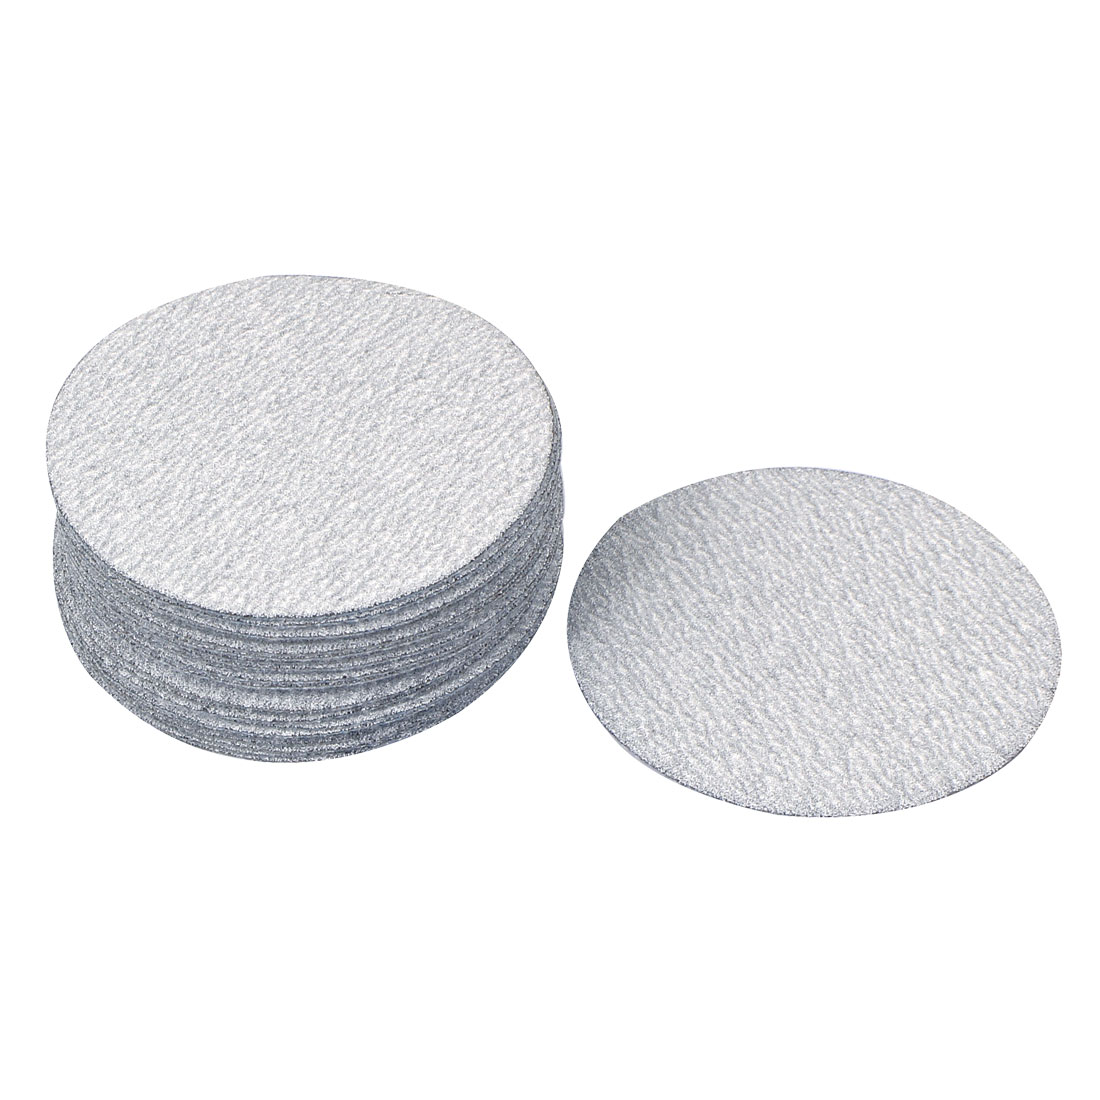 "3"" Dia Polishing Round Dry Abrasive Sanding Sandpaper Sheet Disc 240 Grit 30pcs"